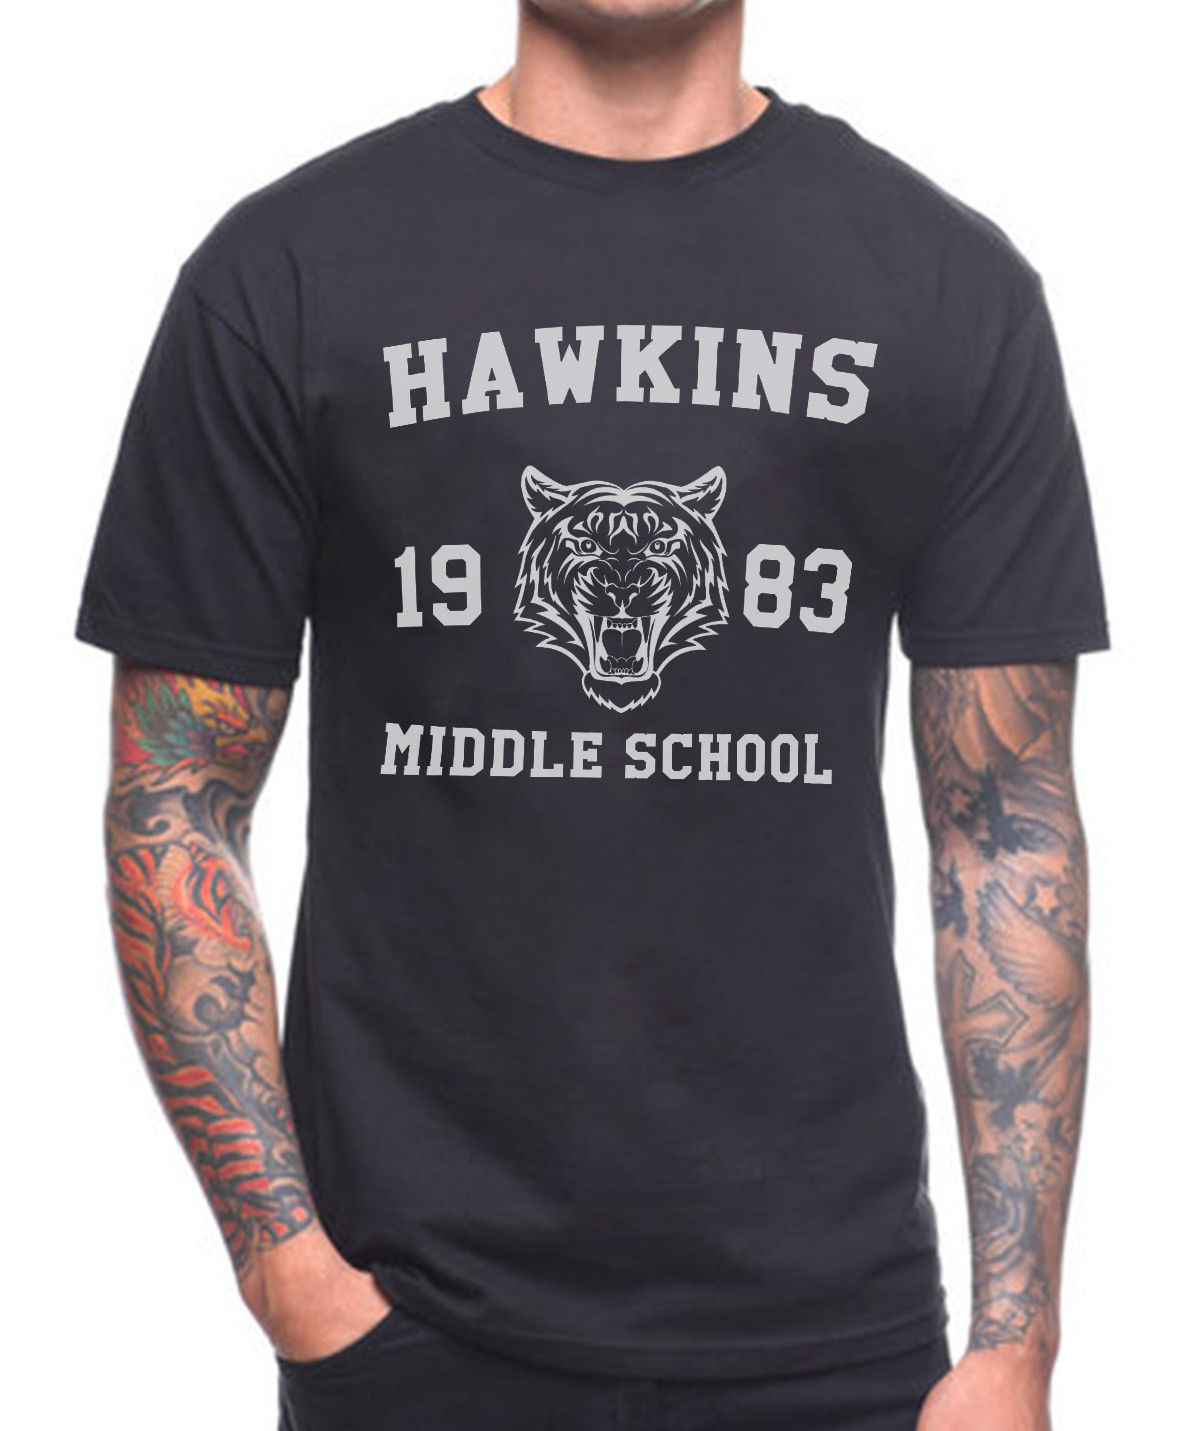 Camiseta de la Escuela Secundaria de Hawkins THE STRANGER THINGS